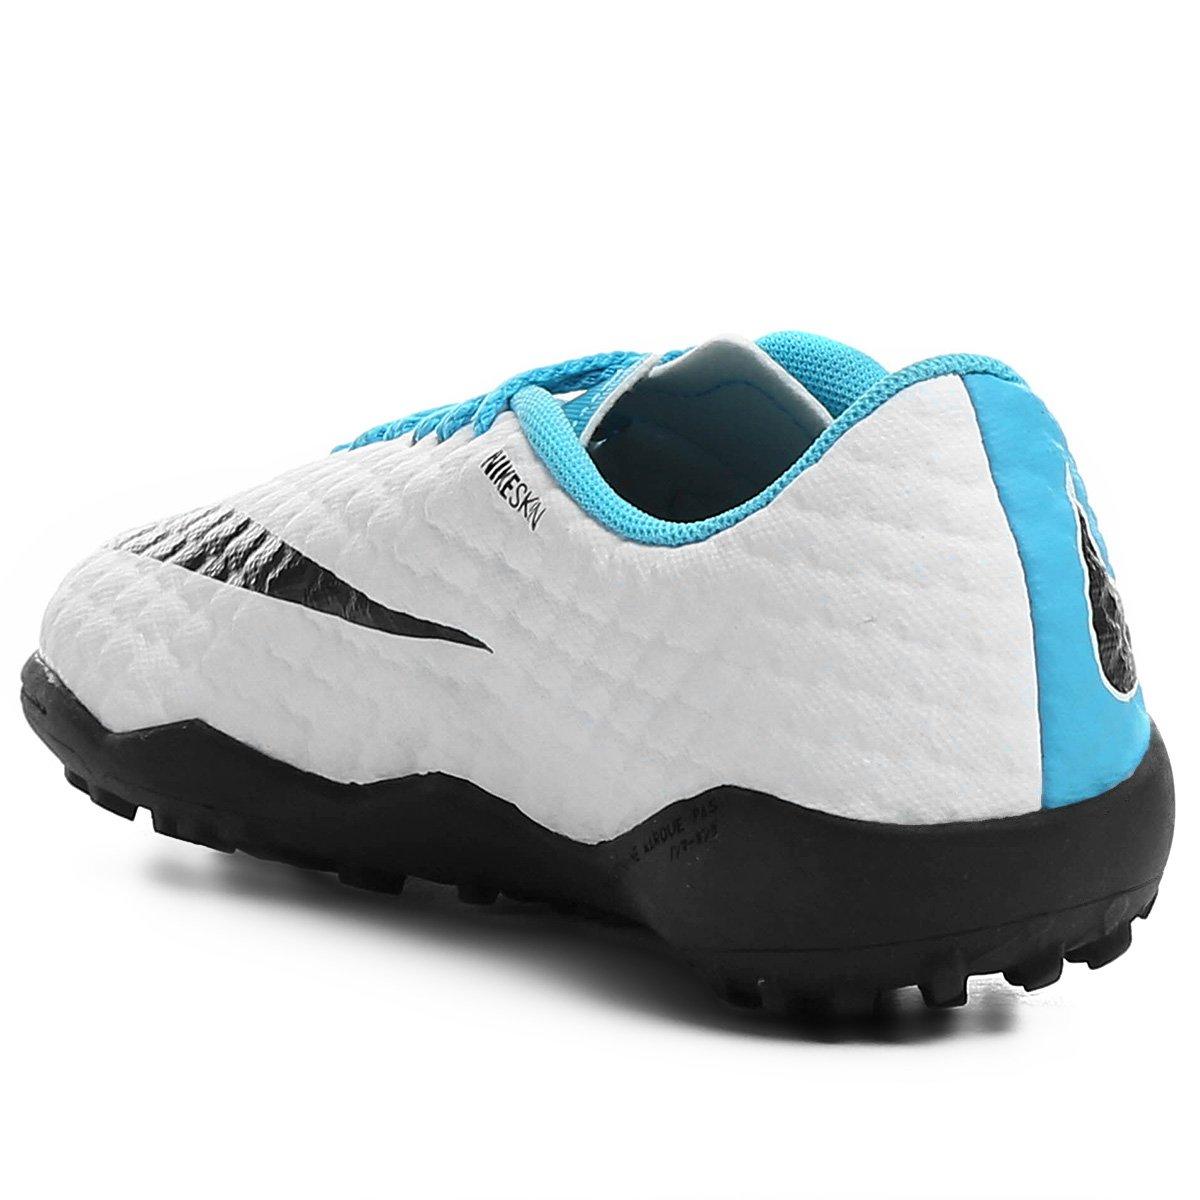 Chuteira Society Infantil Nike Hypervenom Phelon 3 TF - Compre Agora ... 49cd3b78609d5